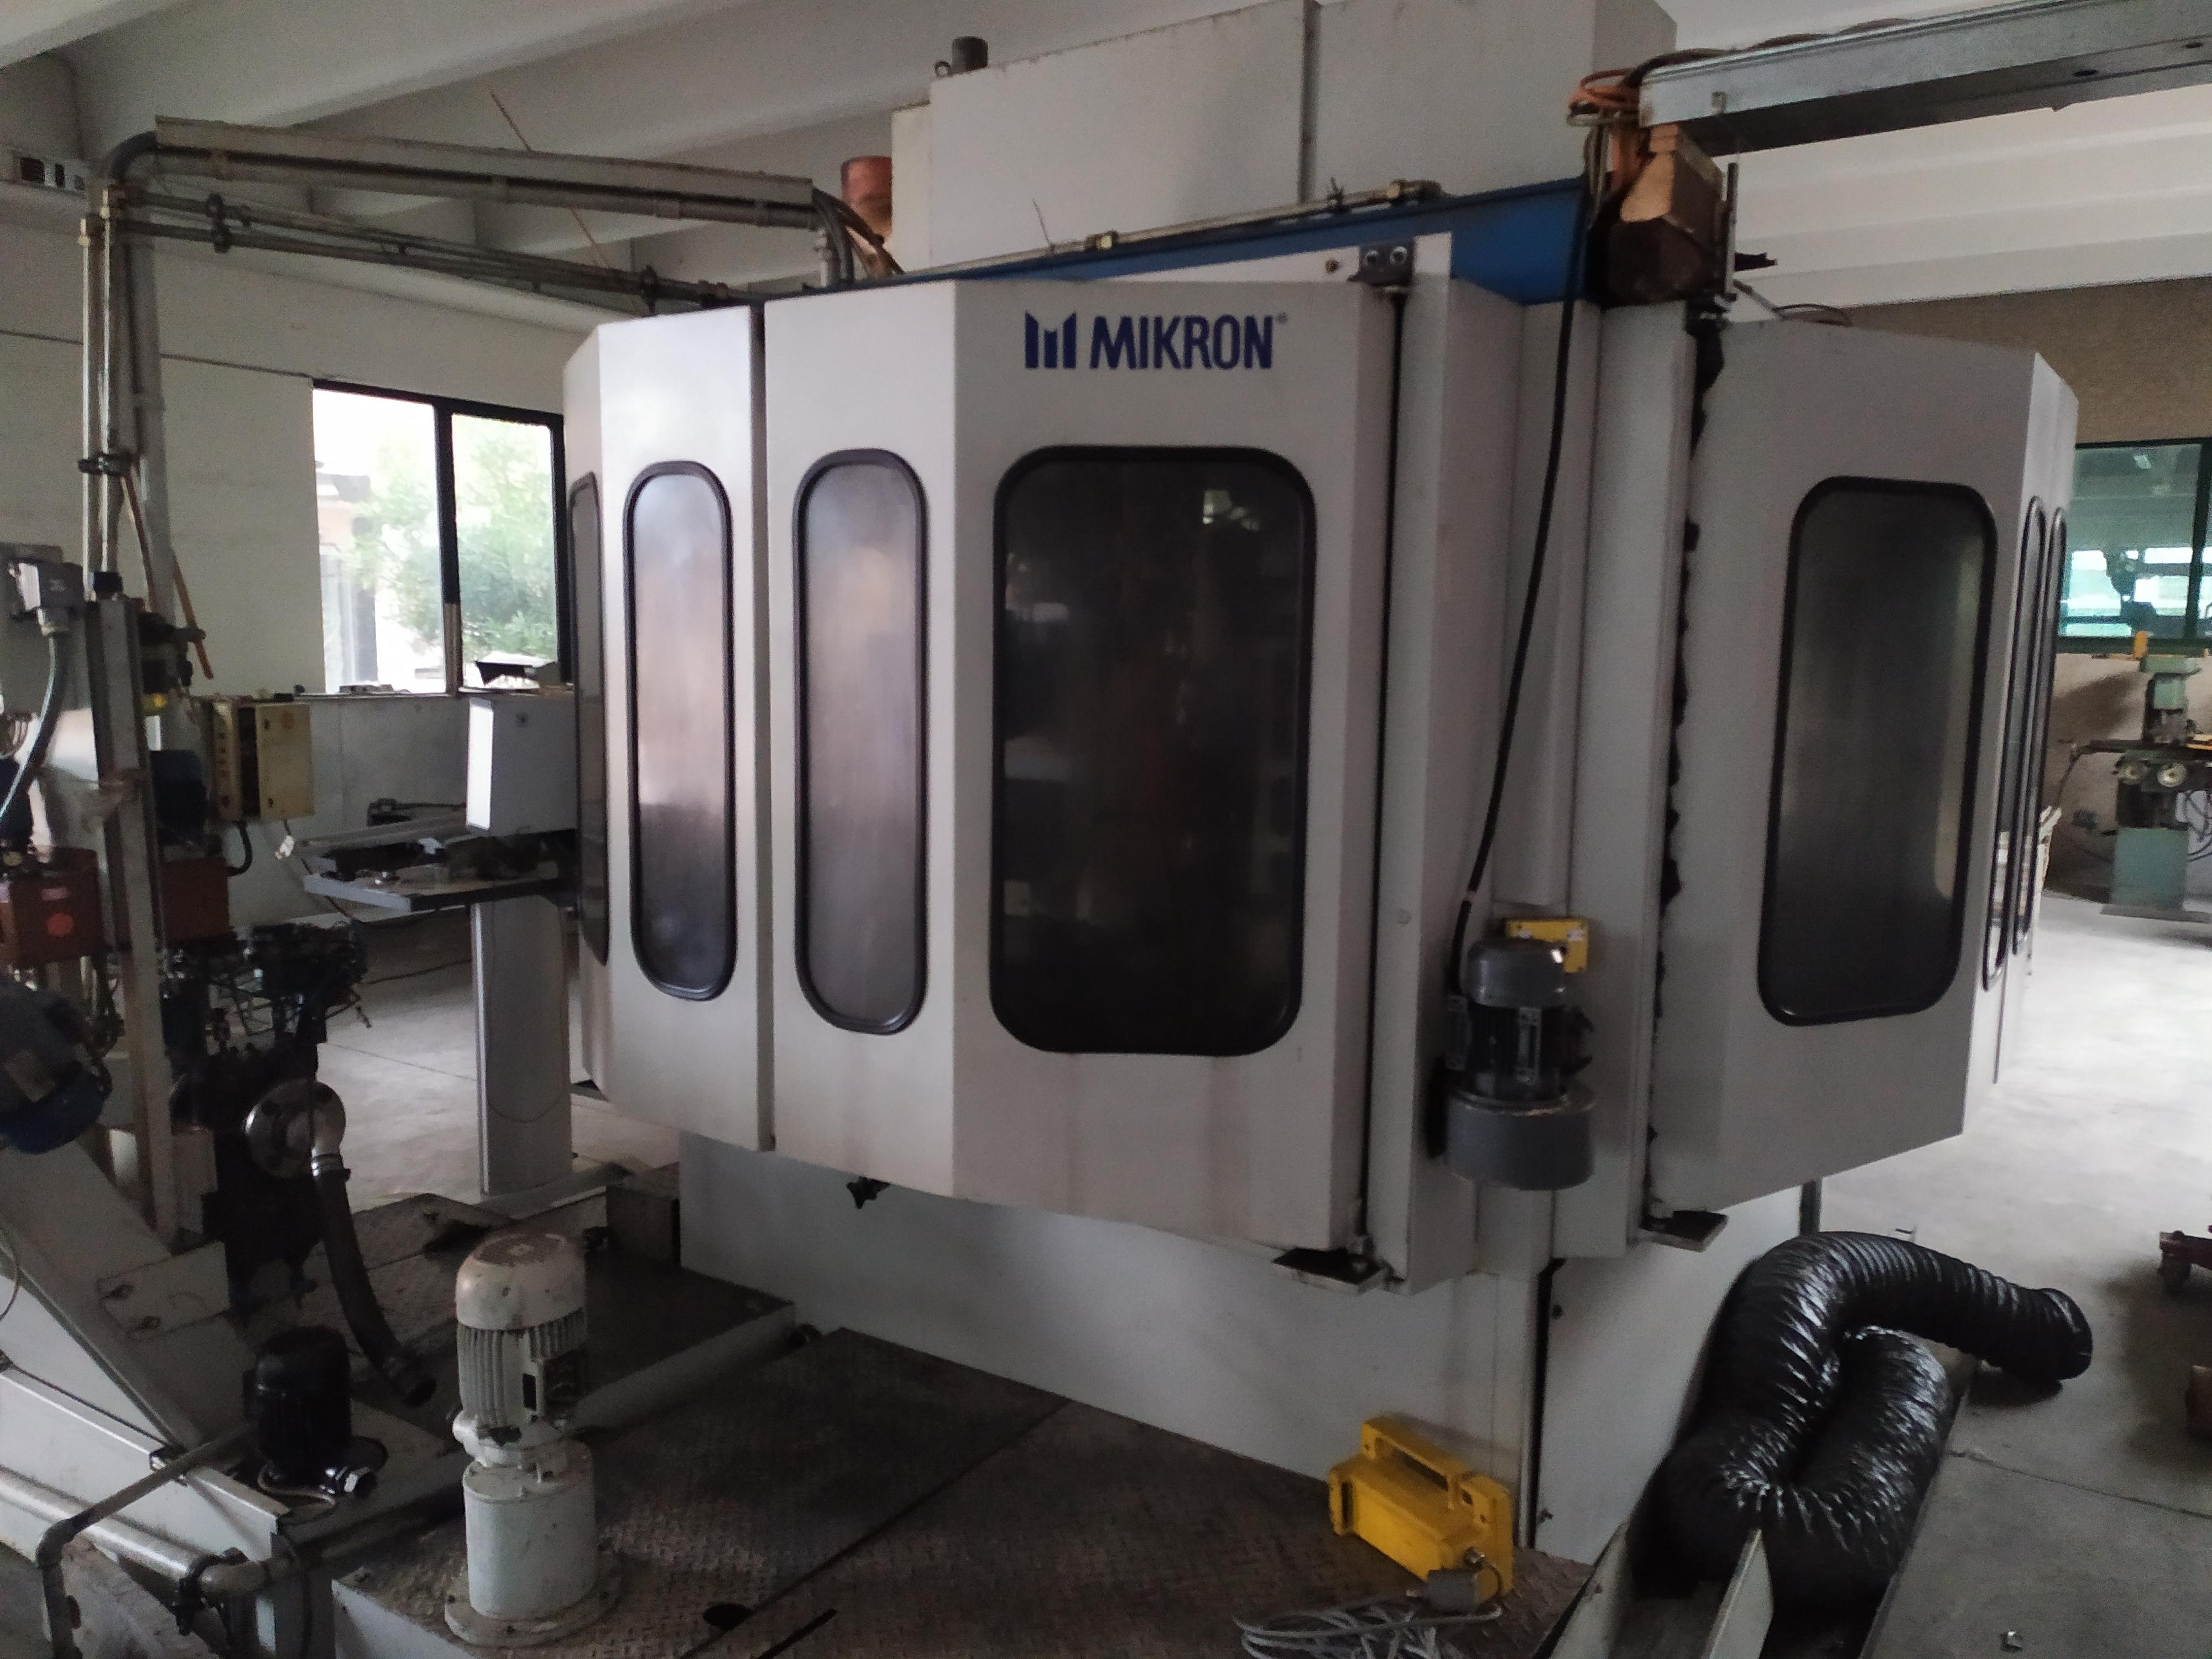 Mikron multifactor usemac 60.012 in vendita - foto 1